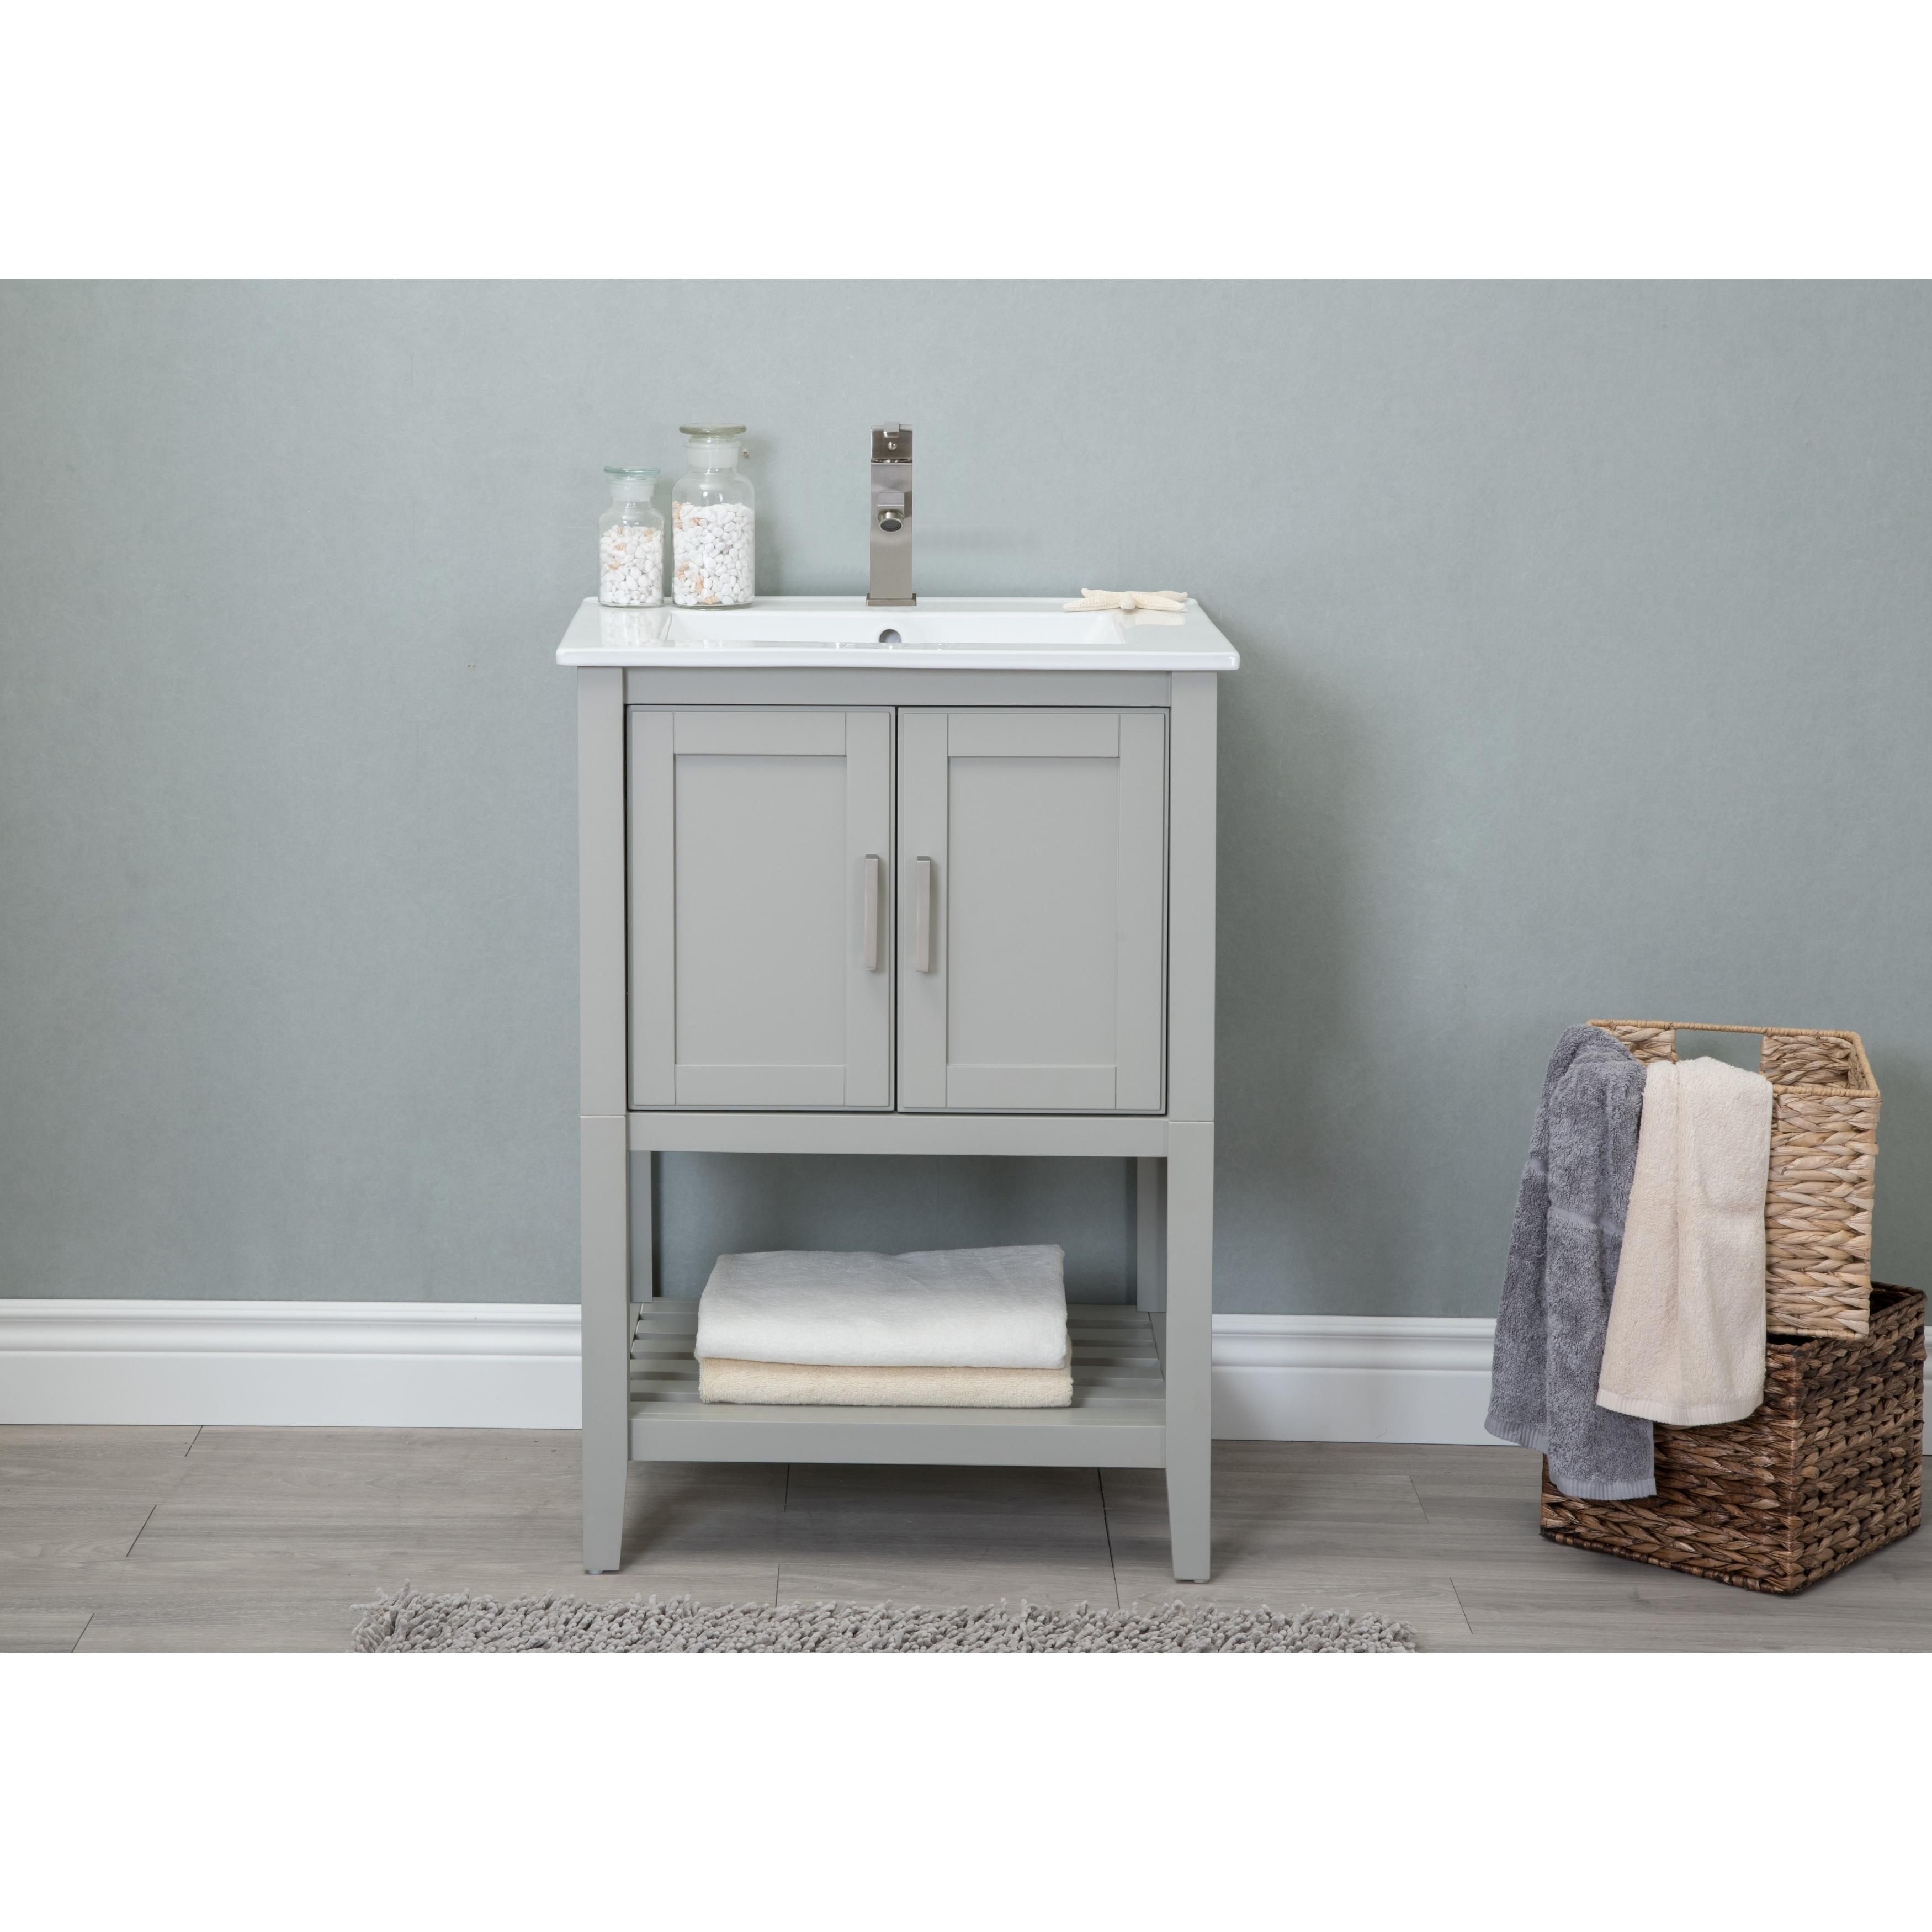 Westchester Gray Bathroom Vanity